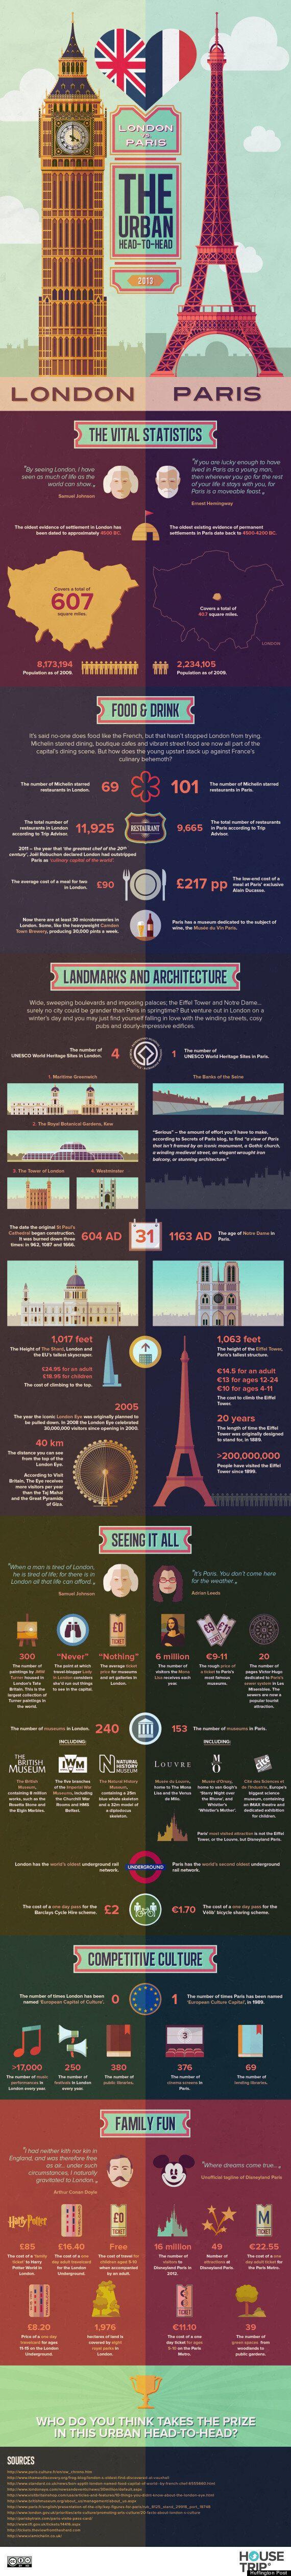 London Vs Paris: The Urban